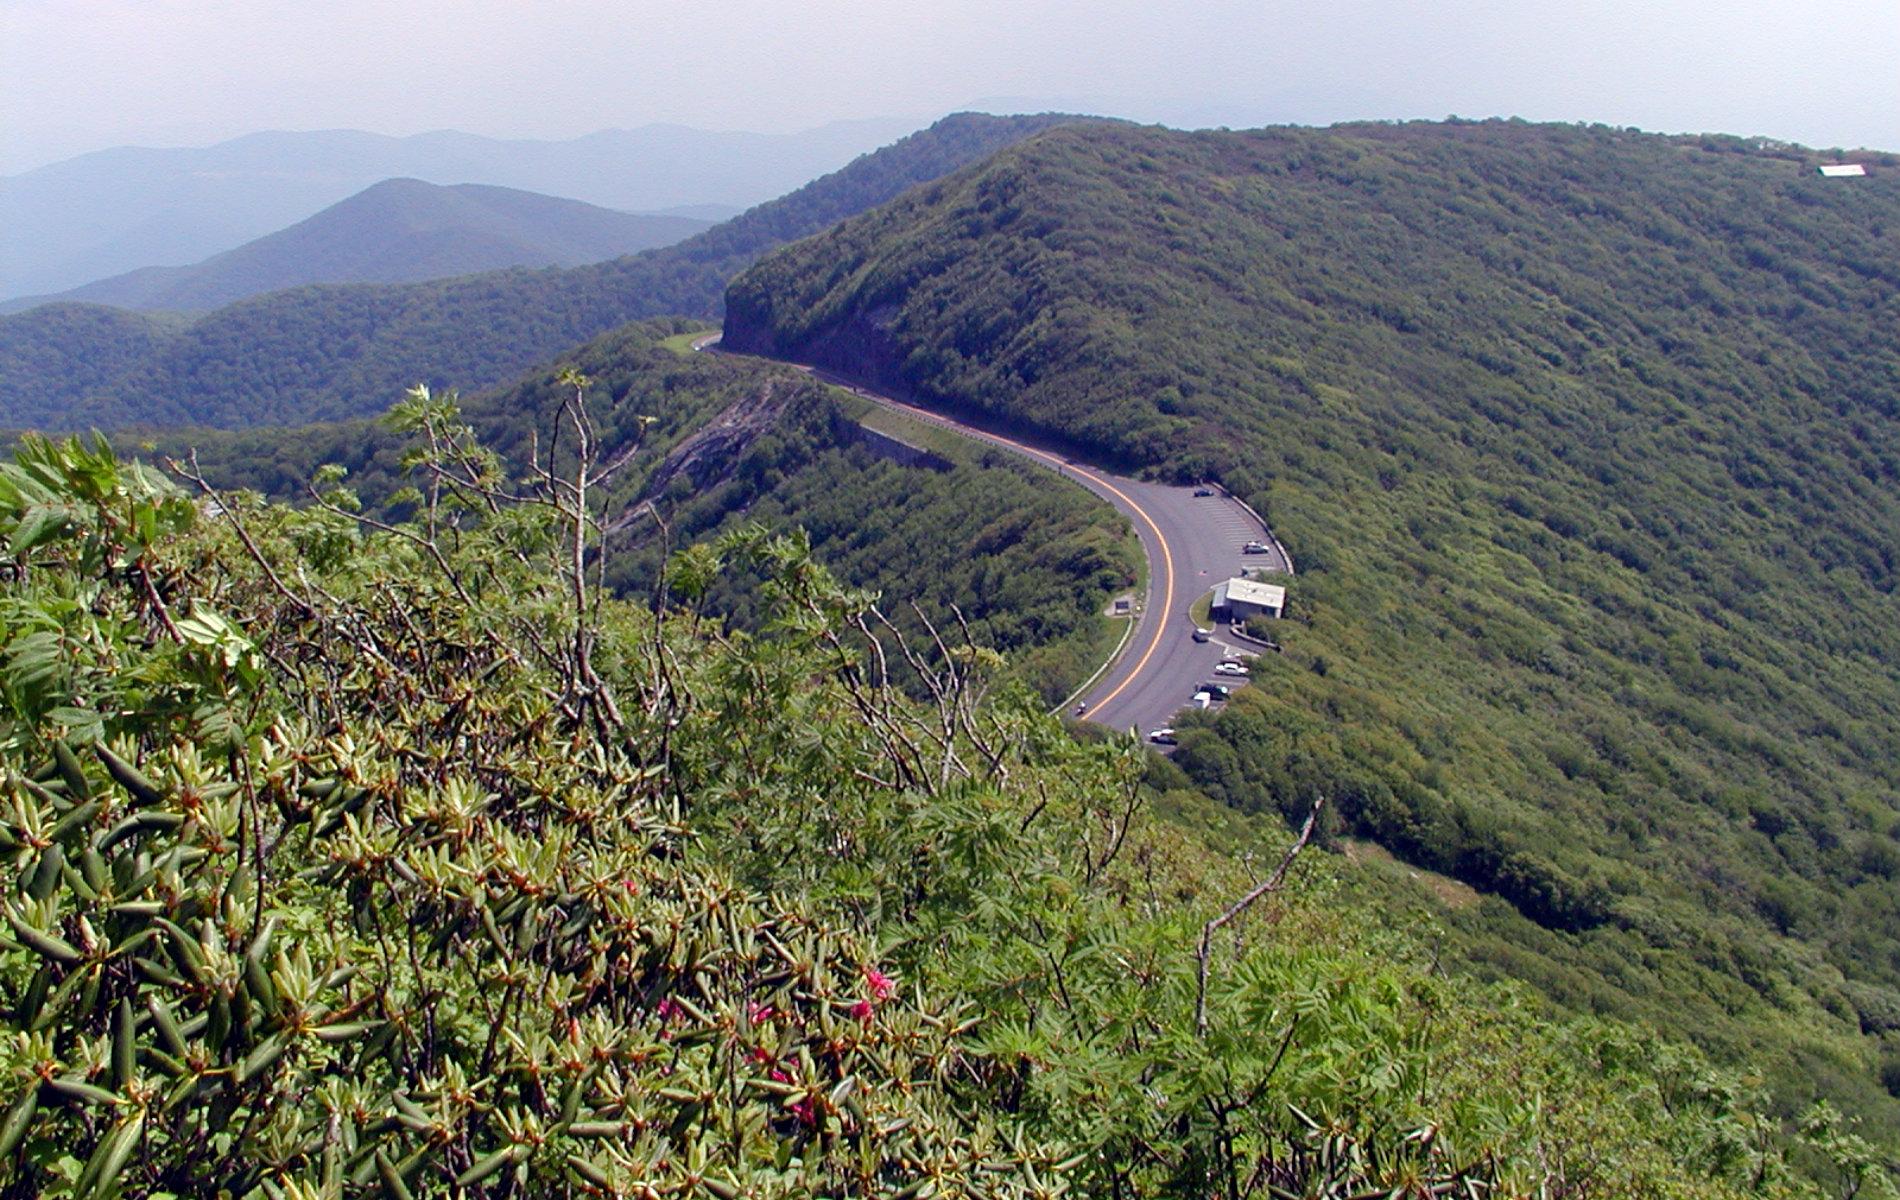 Road curving through tree-filled mountain ridges